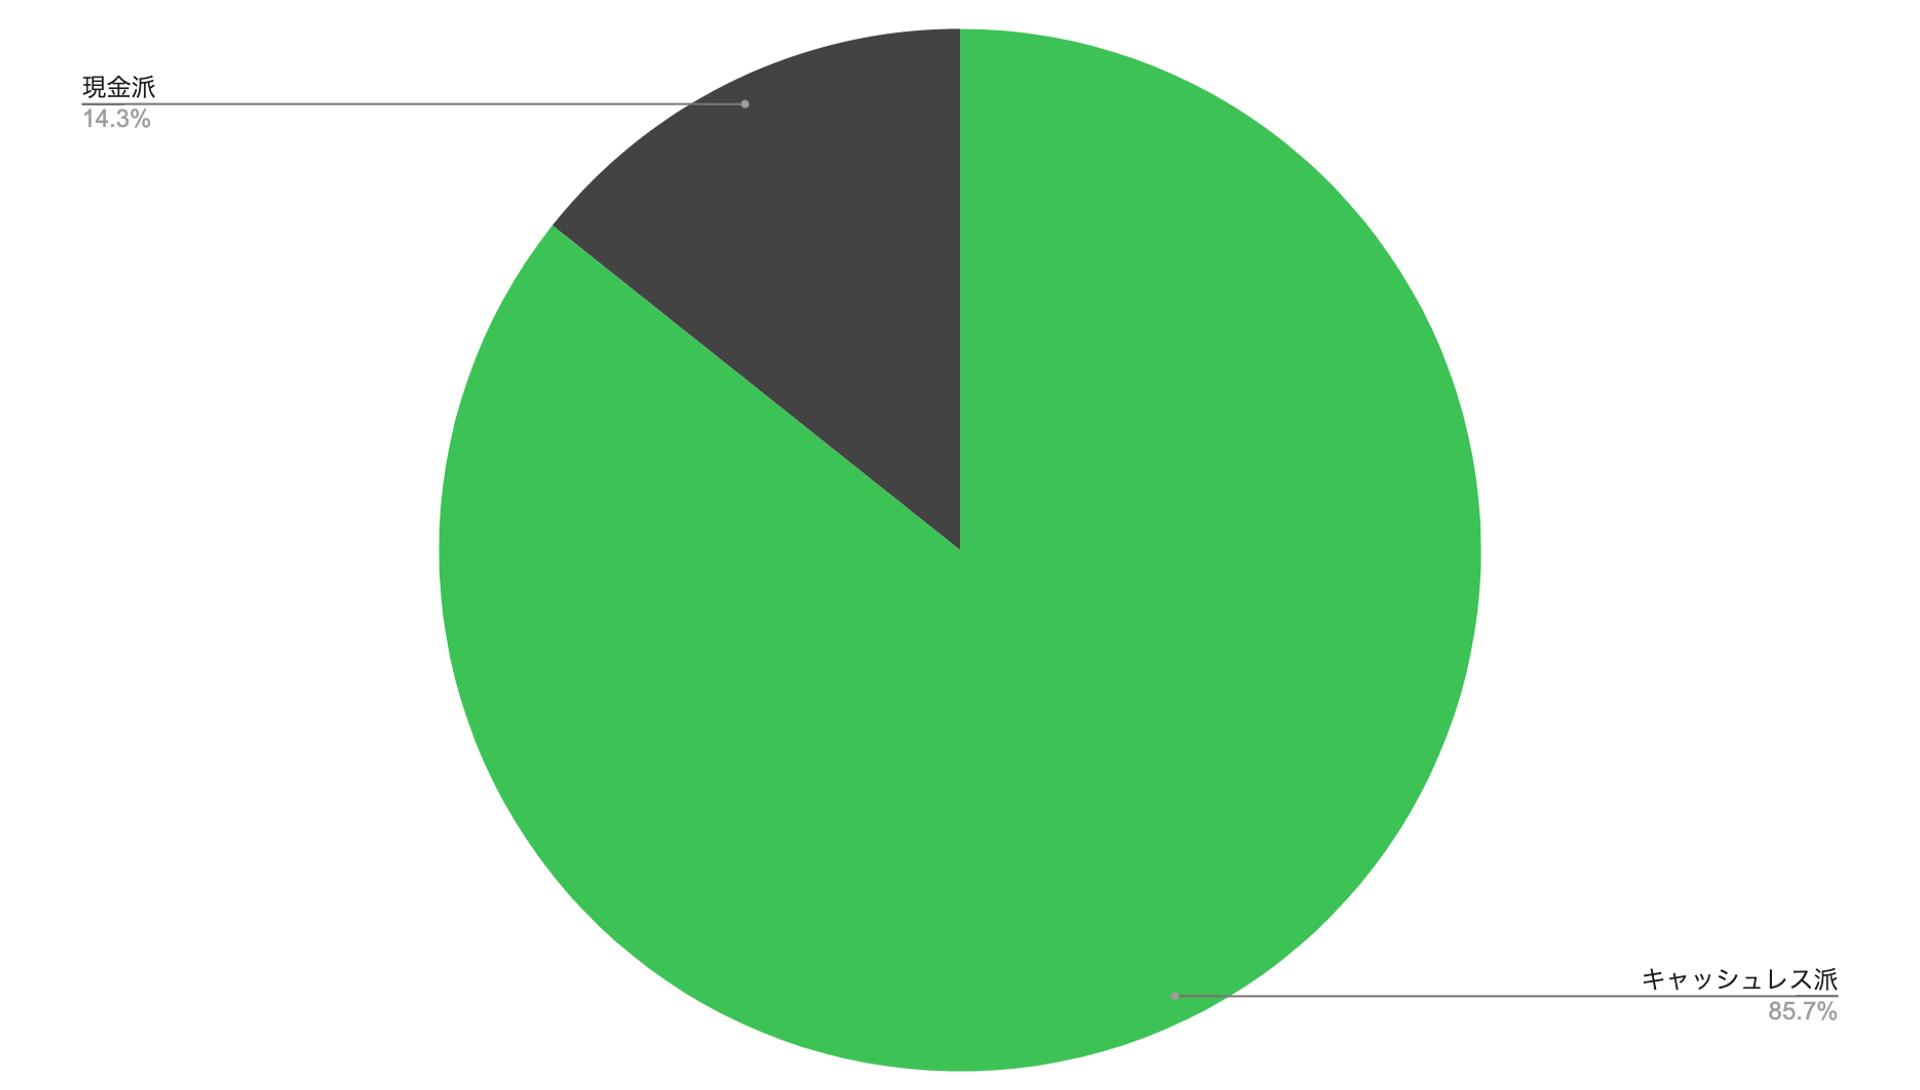 Moneytree LINK データ分析ブログ 現金派とキャッシュレス派の貯蓄が多いと思われるアンケート結果